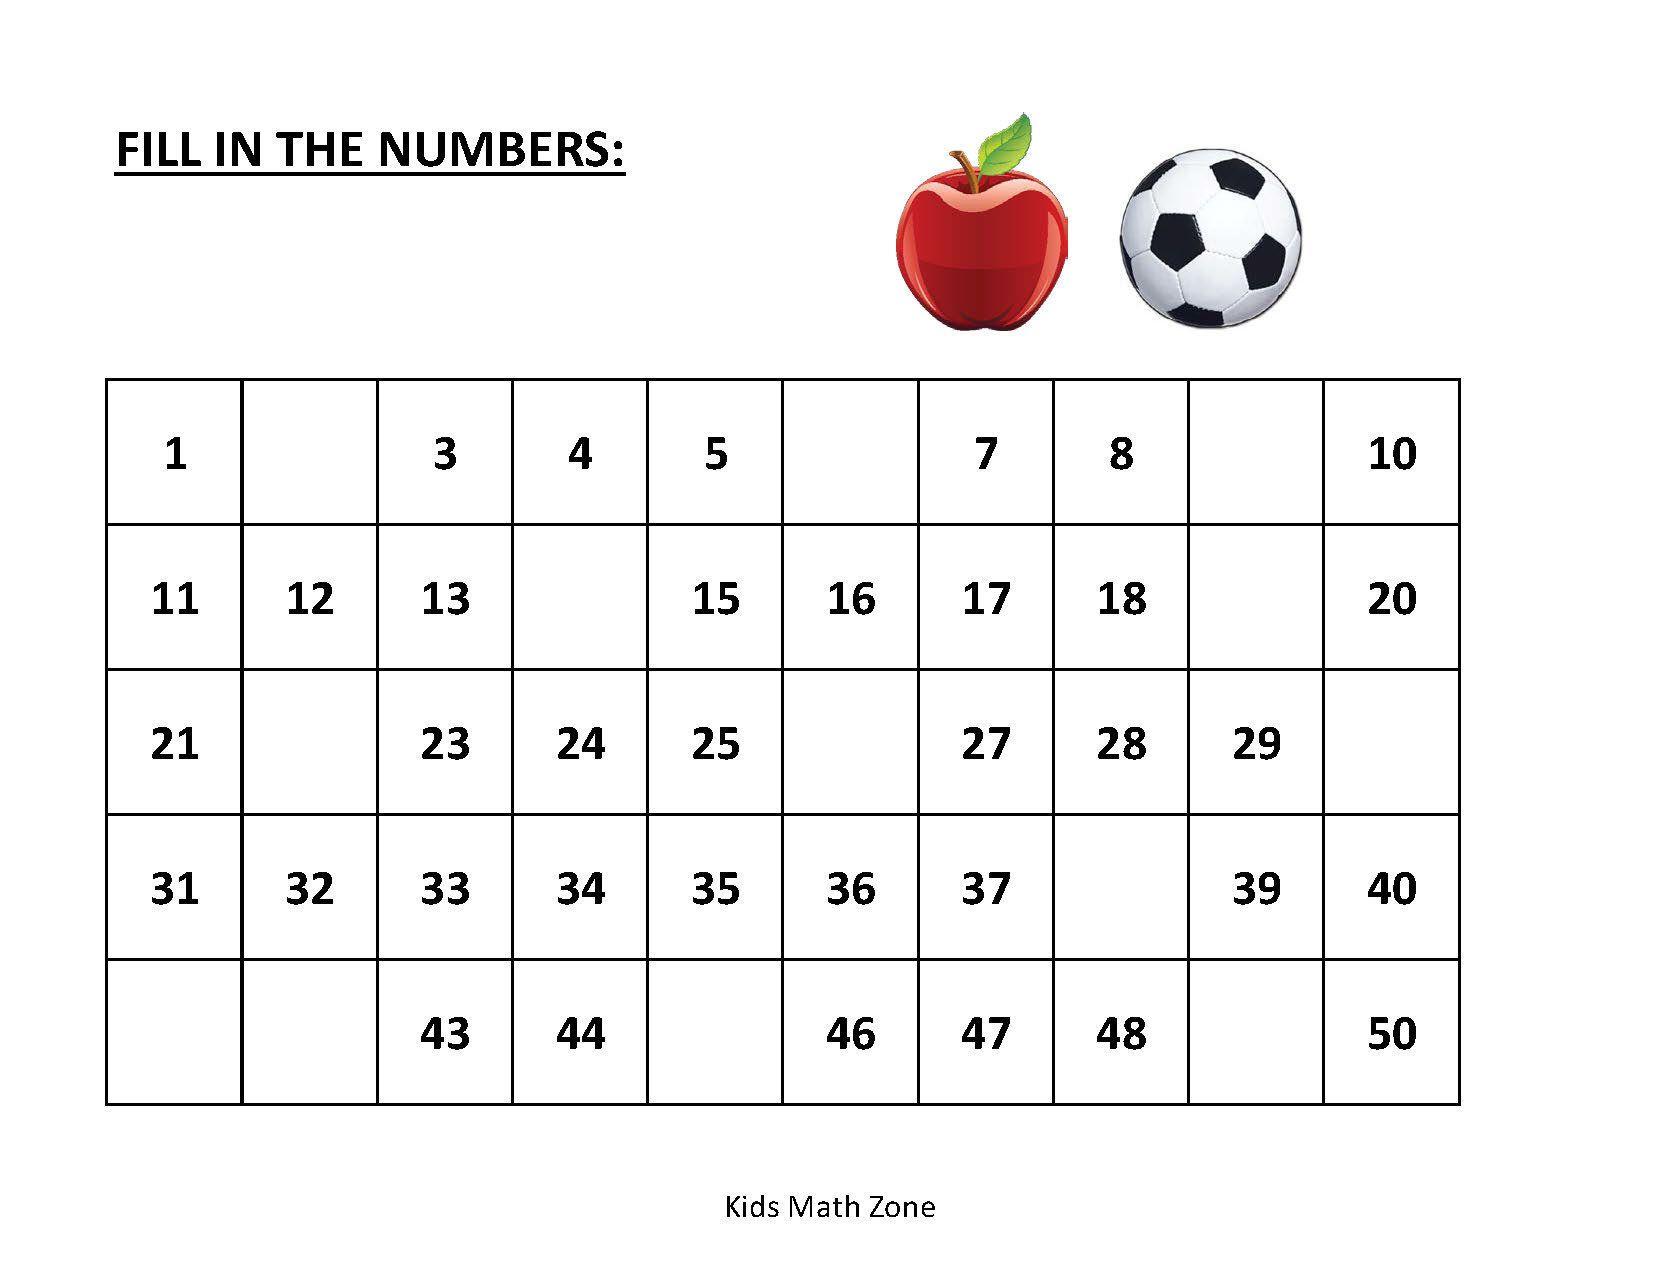 Fill In Missing Numbers 1 To 50 10 Printable Worksheets Etsy Alphabet Worksheets Preschool Kids Math Worksheets Worksheets For Kids